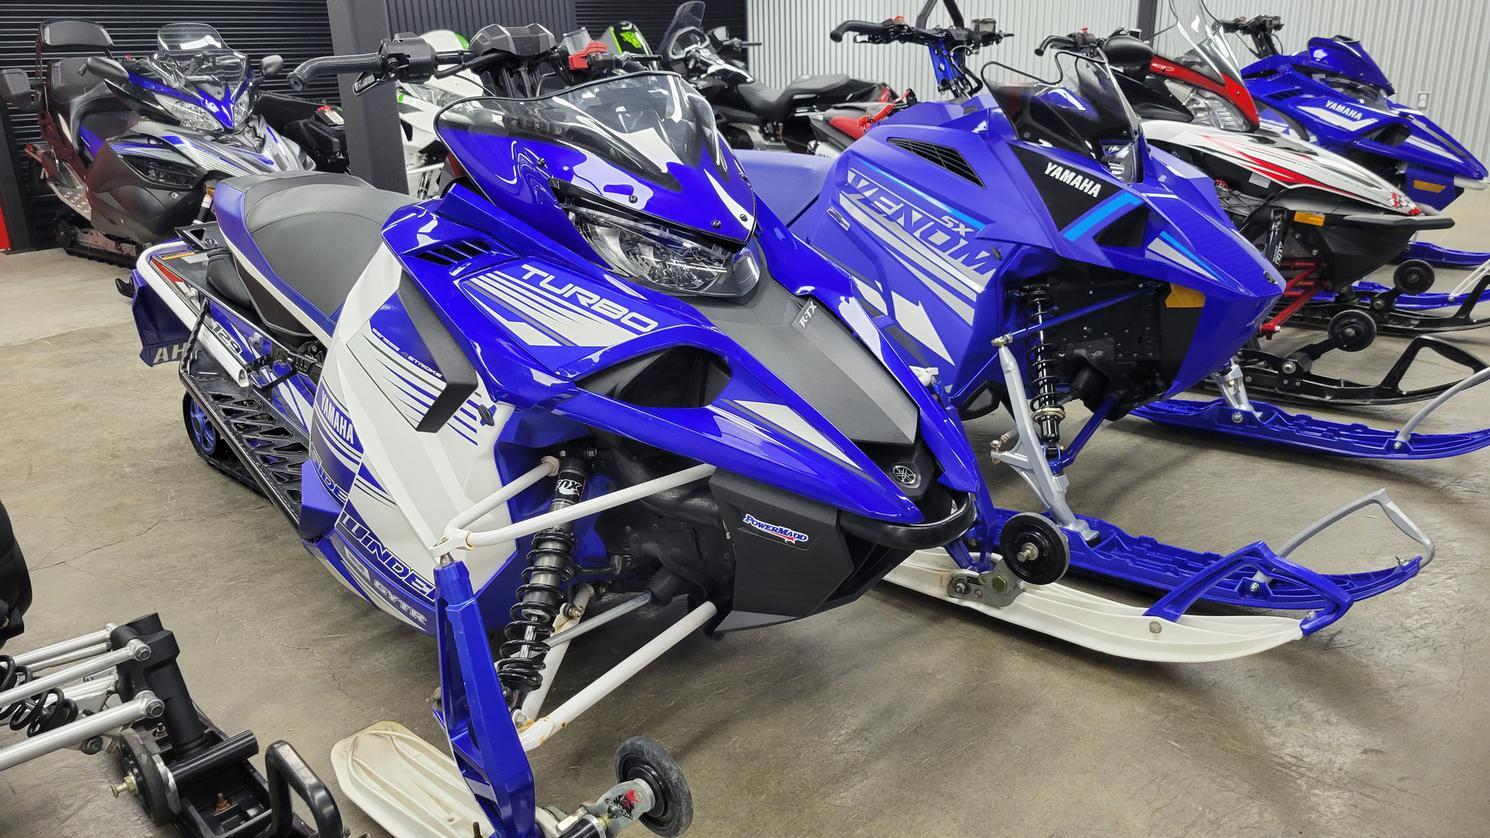 2017 Yamaha Sidewinder rtx se